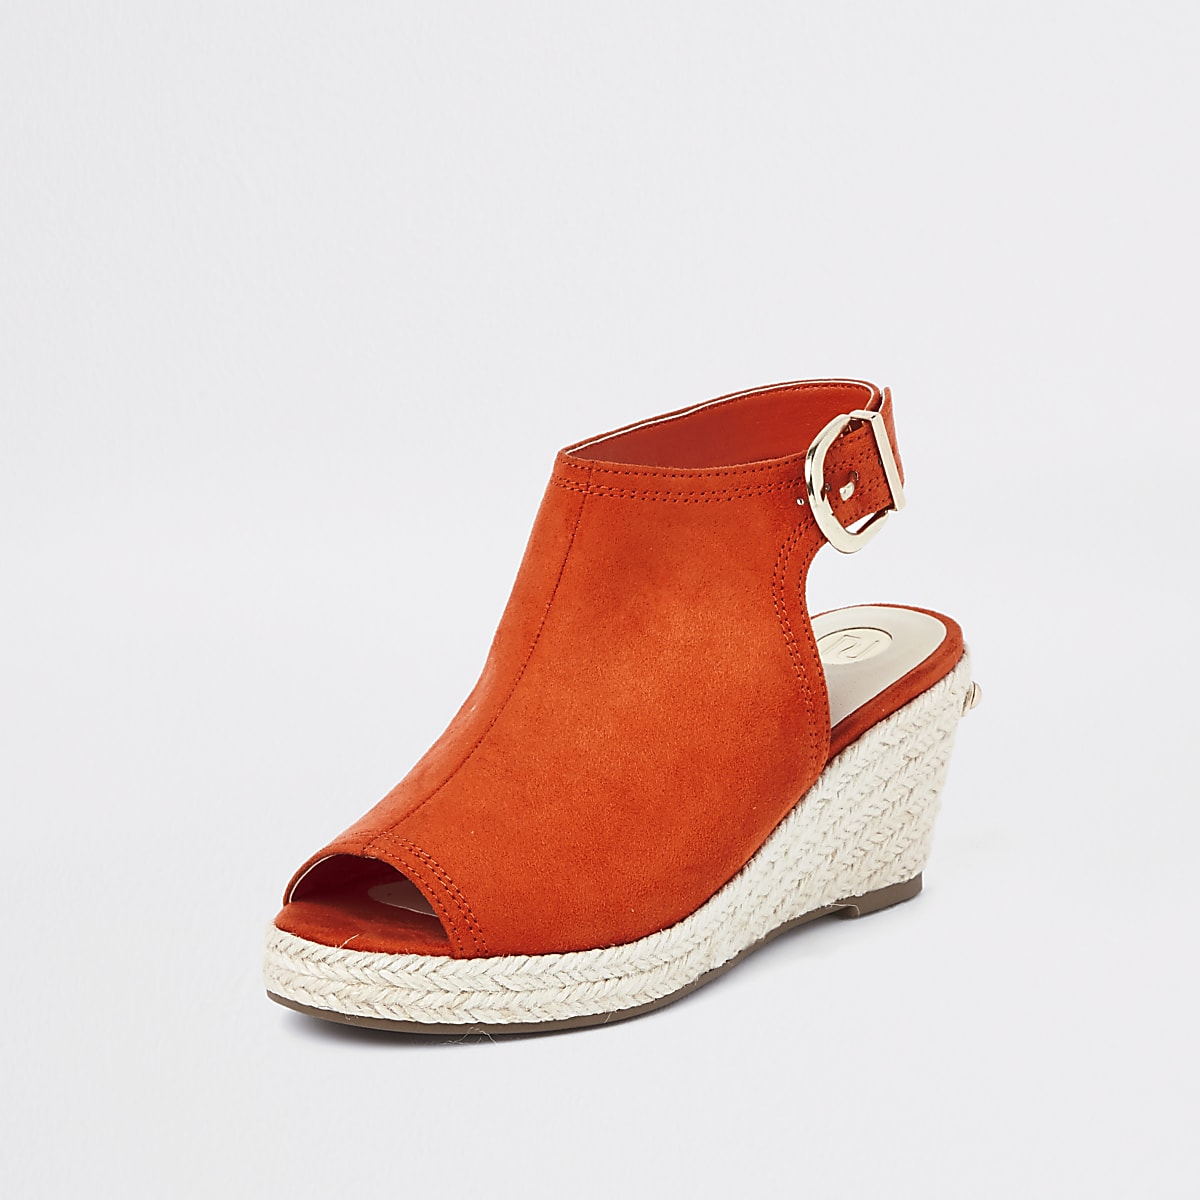 64ba643232c Girls orange espadrille peep toe wedges